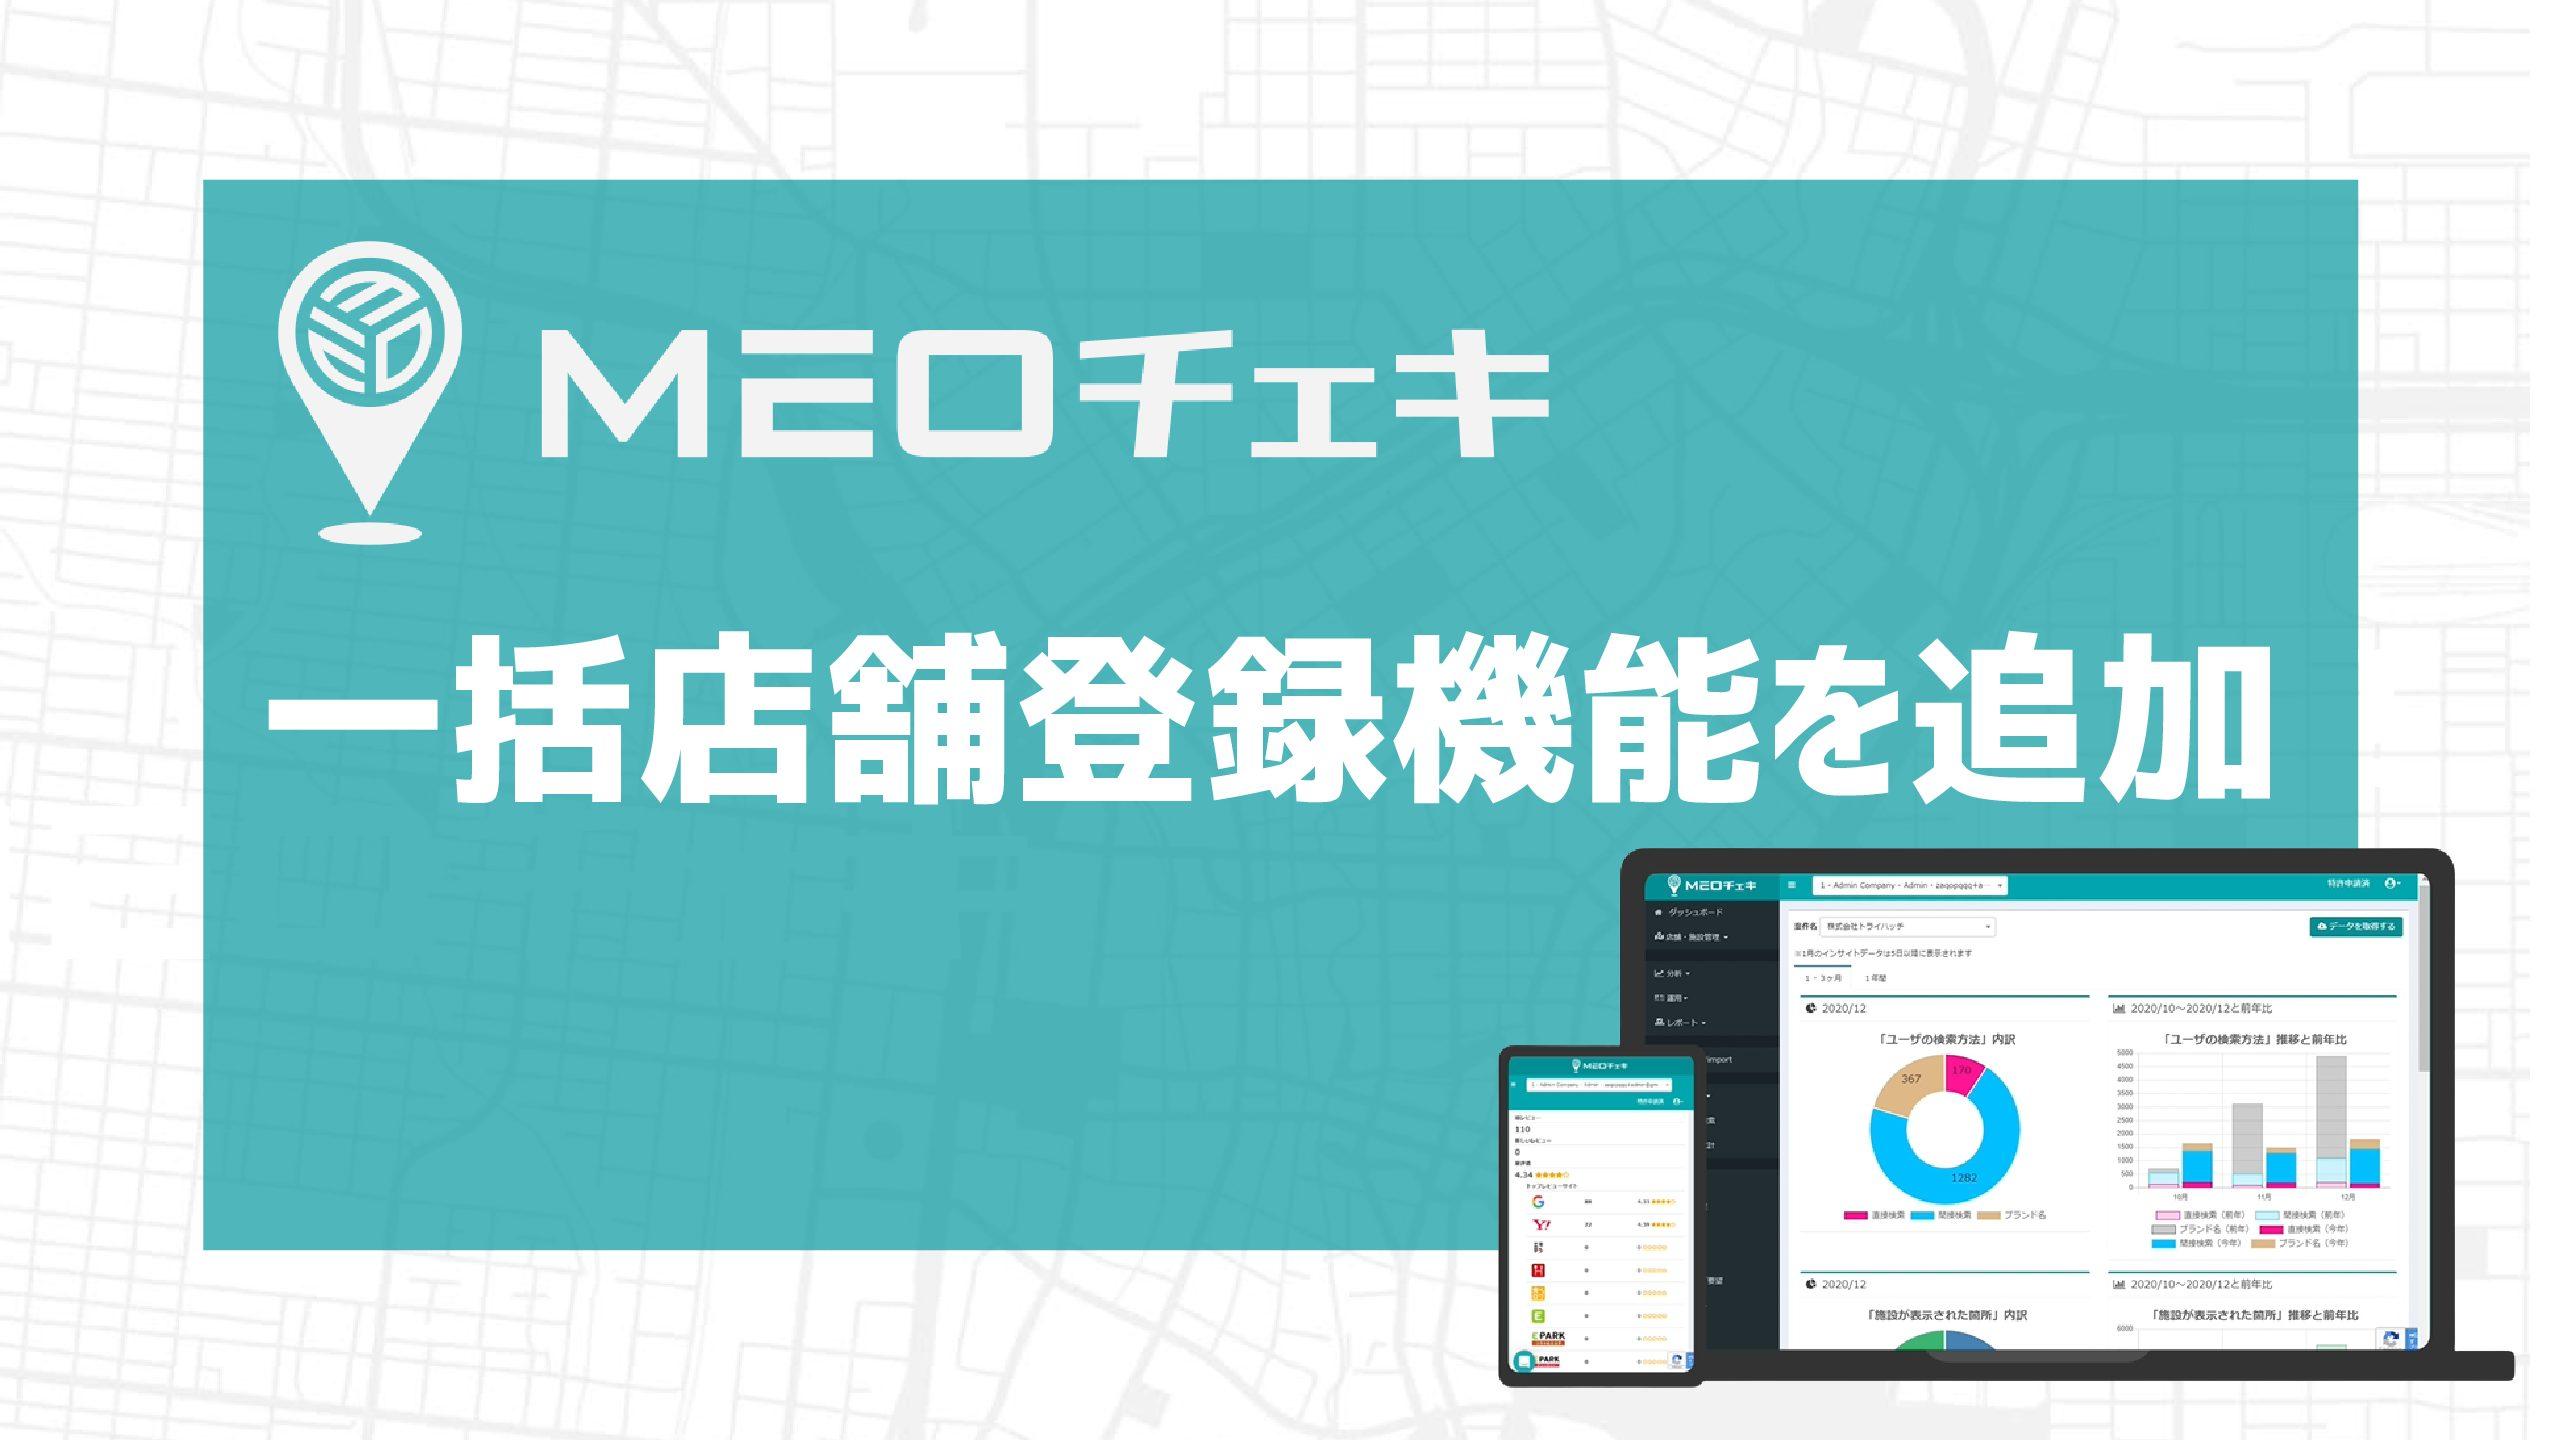 Googleマイビジネス一括編集・管理クラウドツール『MEOチェキ』が多店舗向けに一括店舗登録機能を追加!